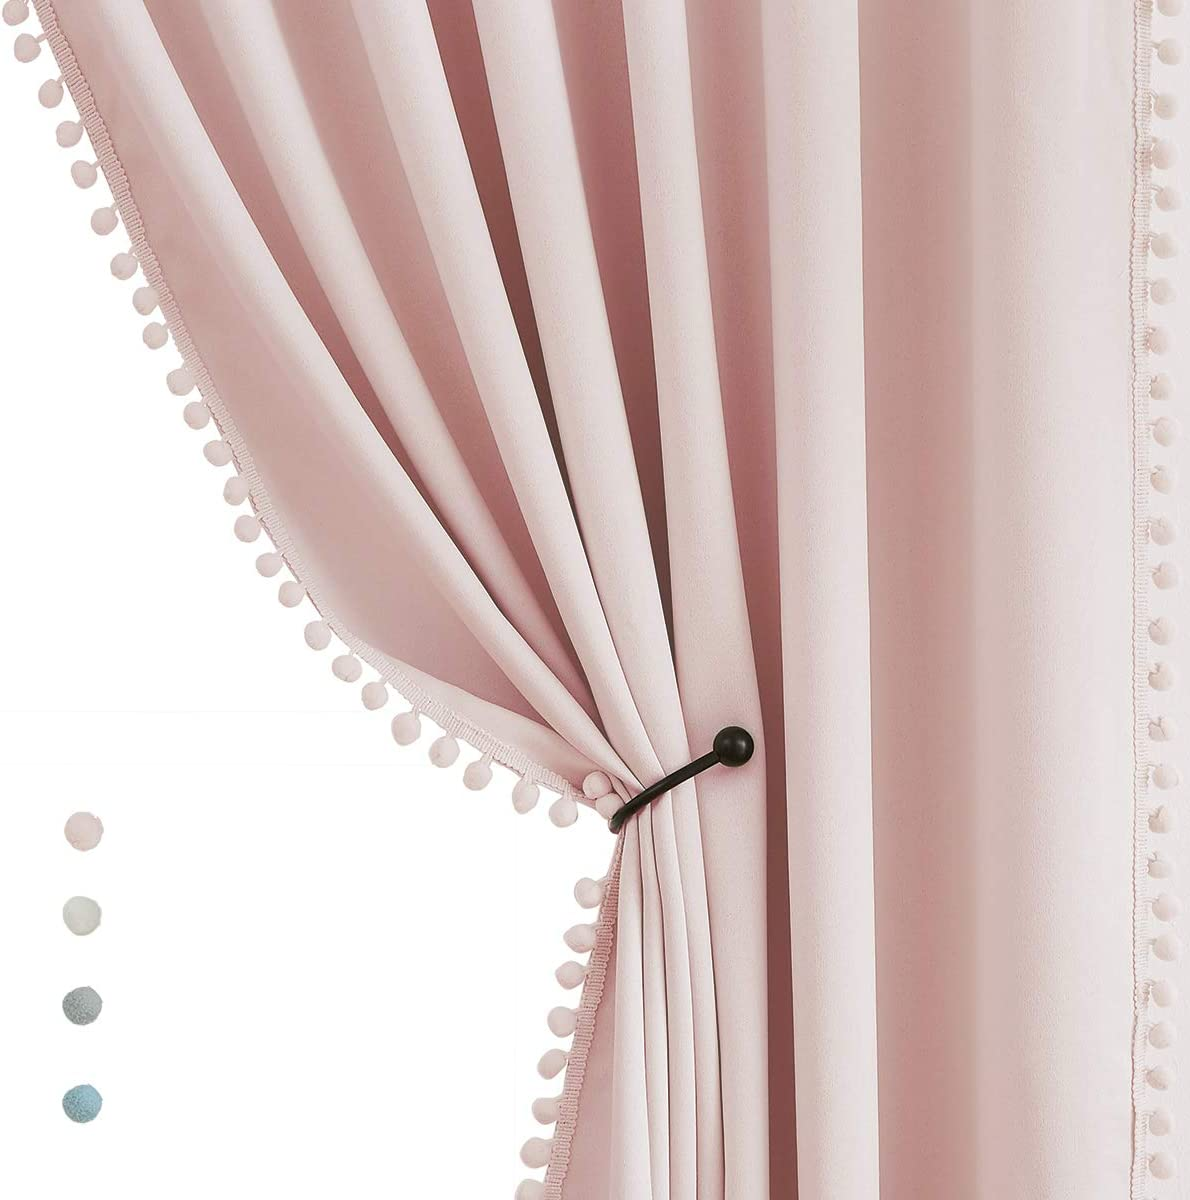 Treatmentex High material Quality inspection Pom-Pom Pink Half-Blackout Curtains 45